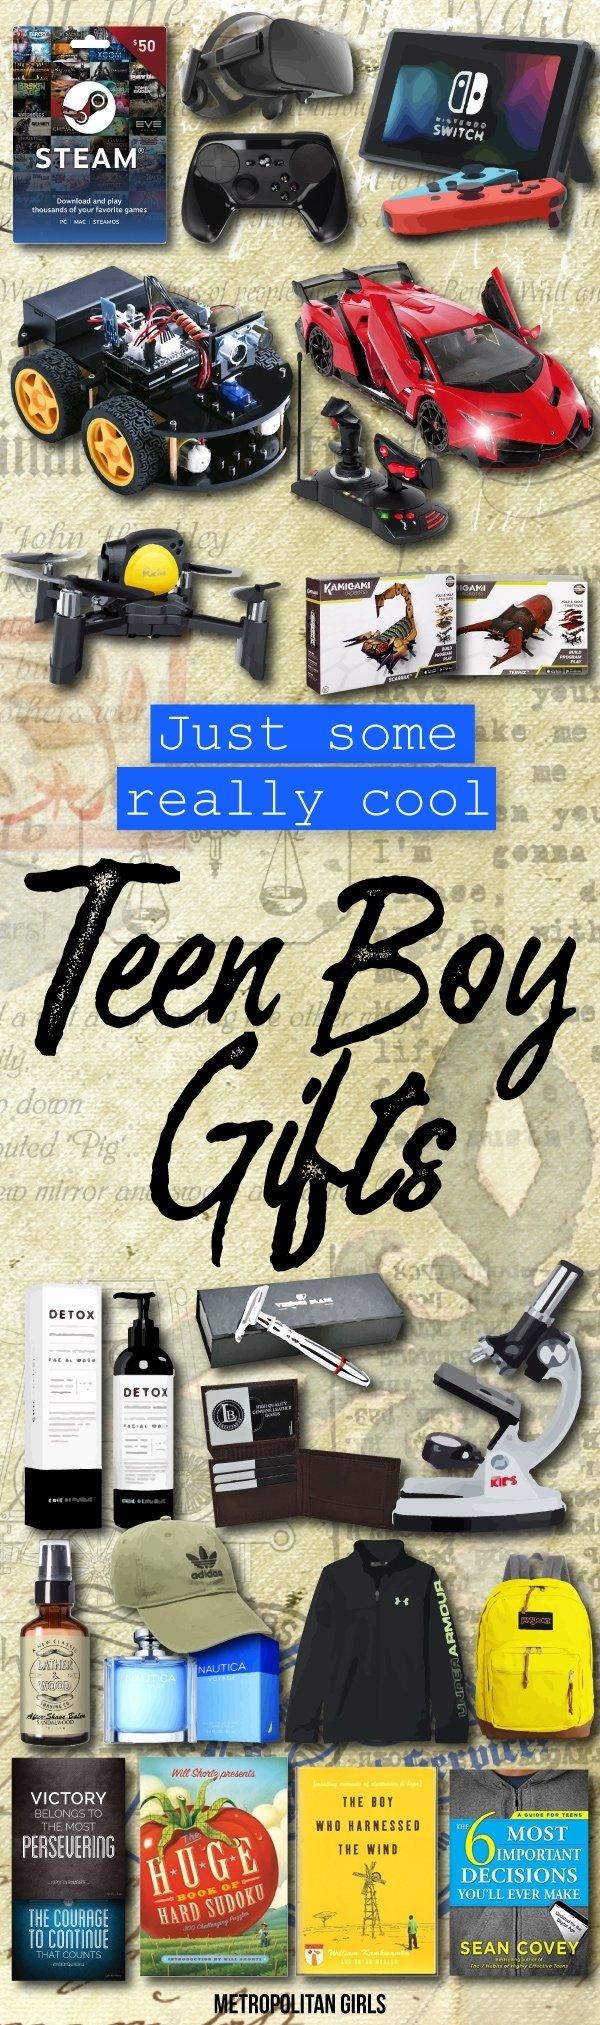 10 Nice Gift Ideas For 15 Year Old Boys teen boy gifts gift ideas for 15 18 year old teenage guys 1